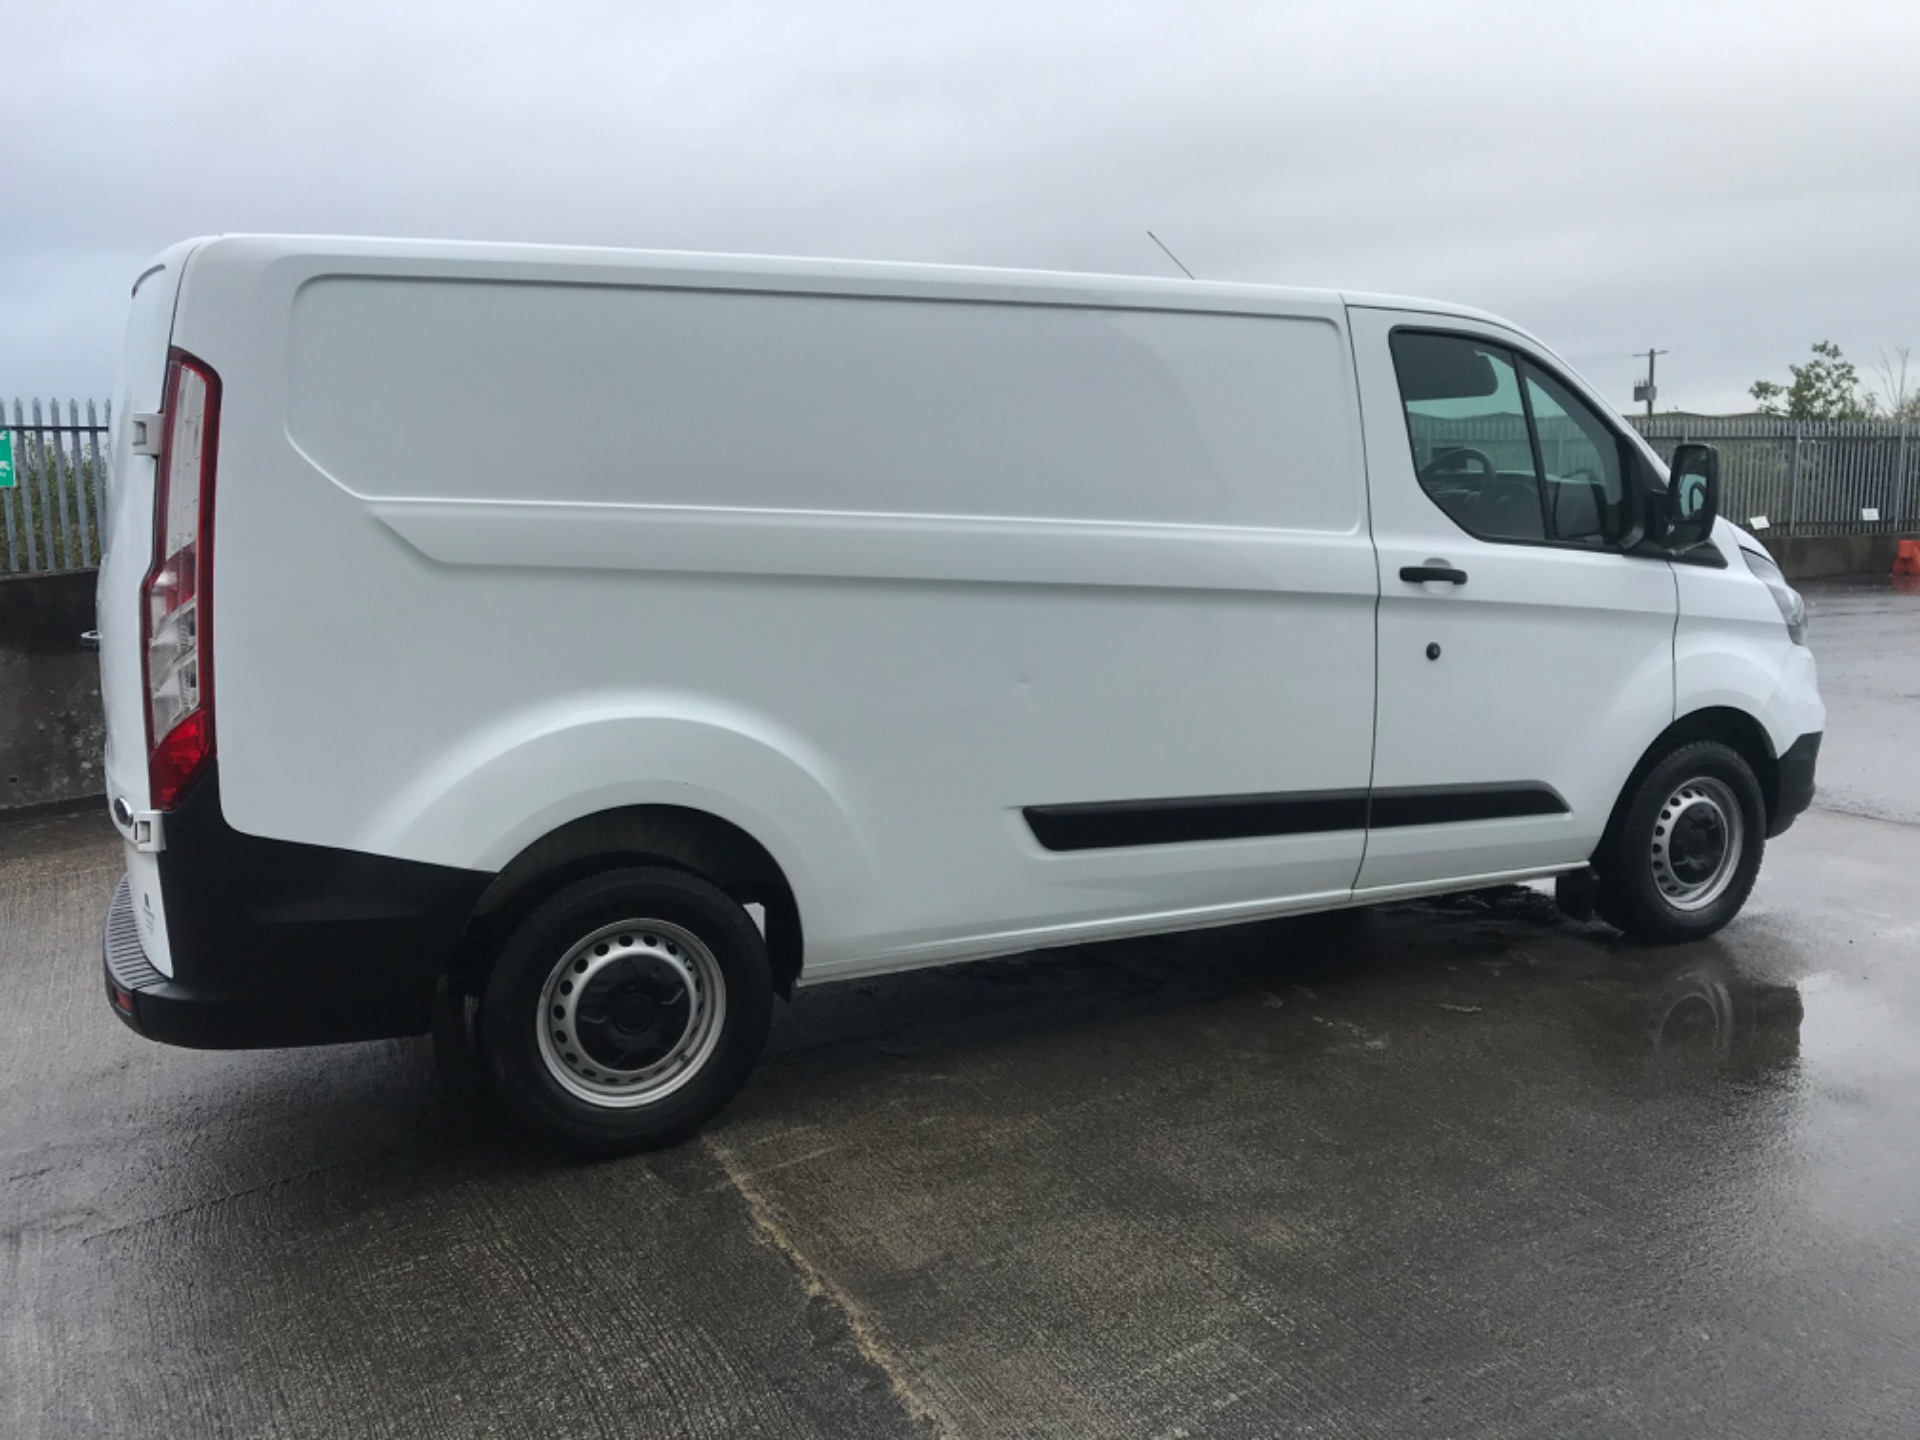 2018 Ford Transit Custom Custom 300 Lbase 2.0 105PS 3DR (181D27029) Image 4